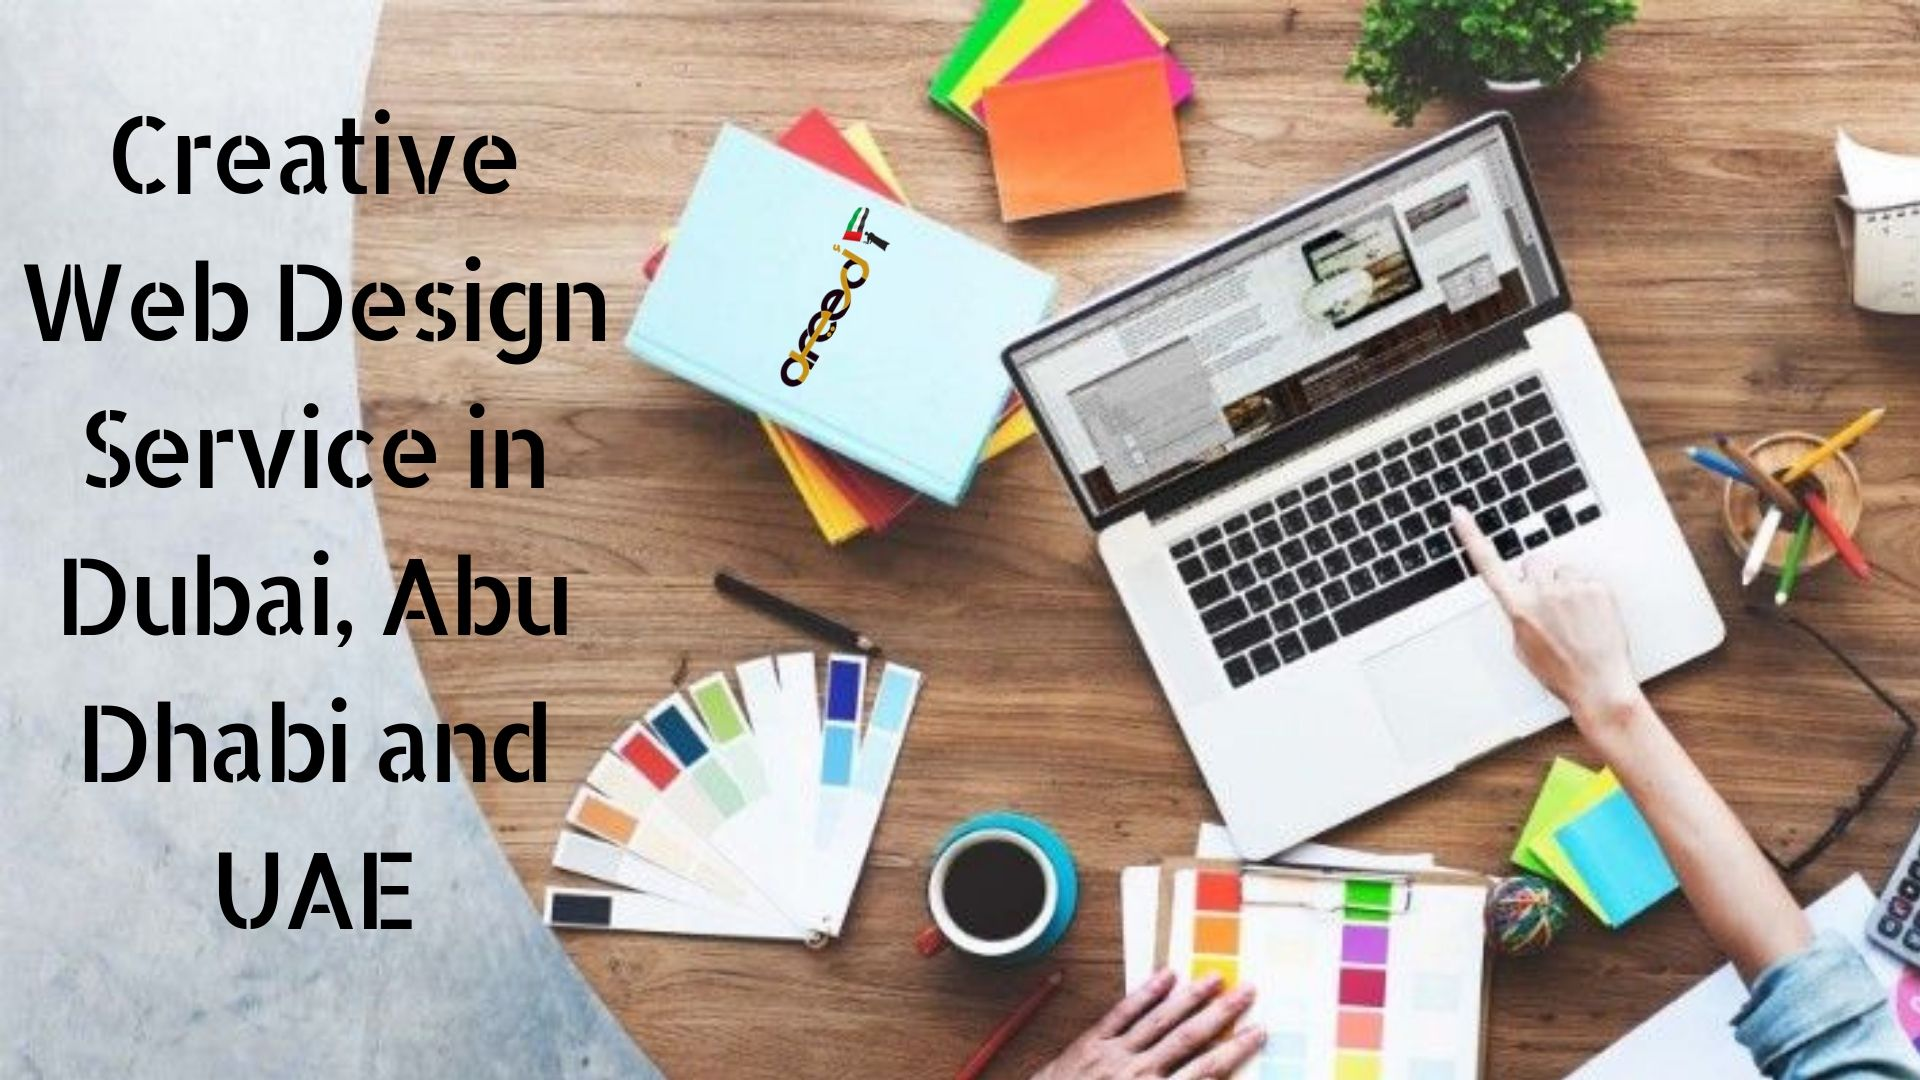 Top Web Design Company In Abu Dhabi Dubai And Uae Areed It Services Web Design Company Web Design Services Website Design